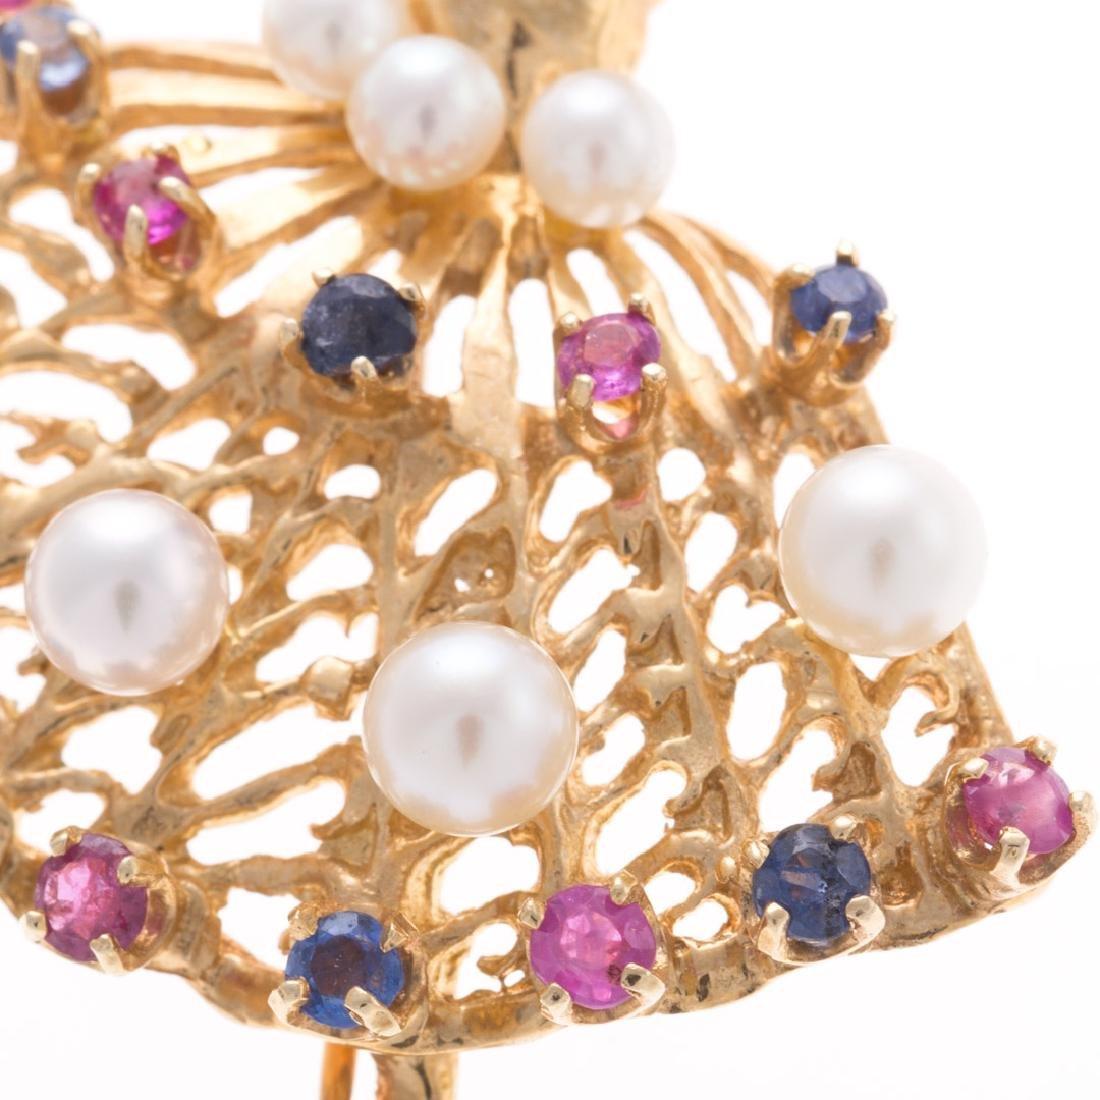 A Lady's 14K Pearl & Gemstone Ballerina Pin - 2